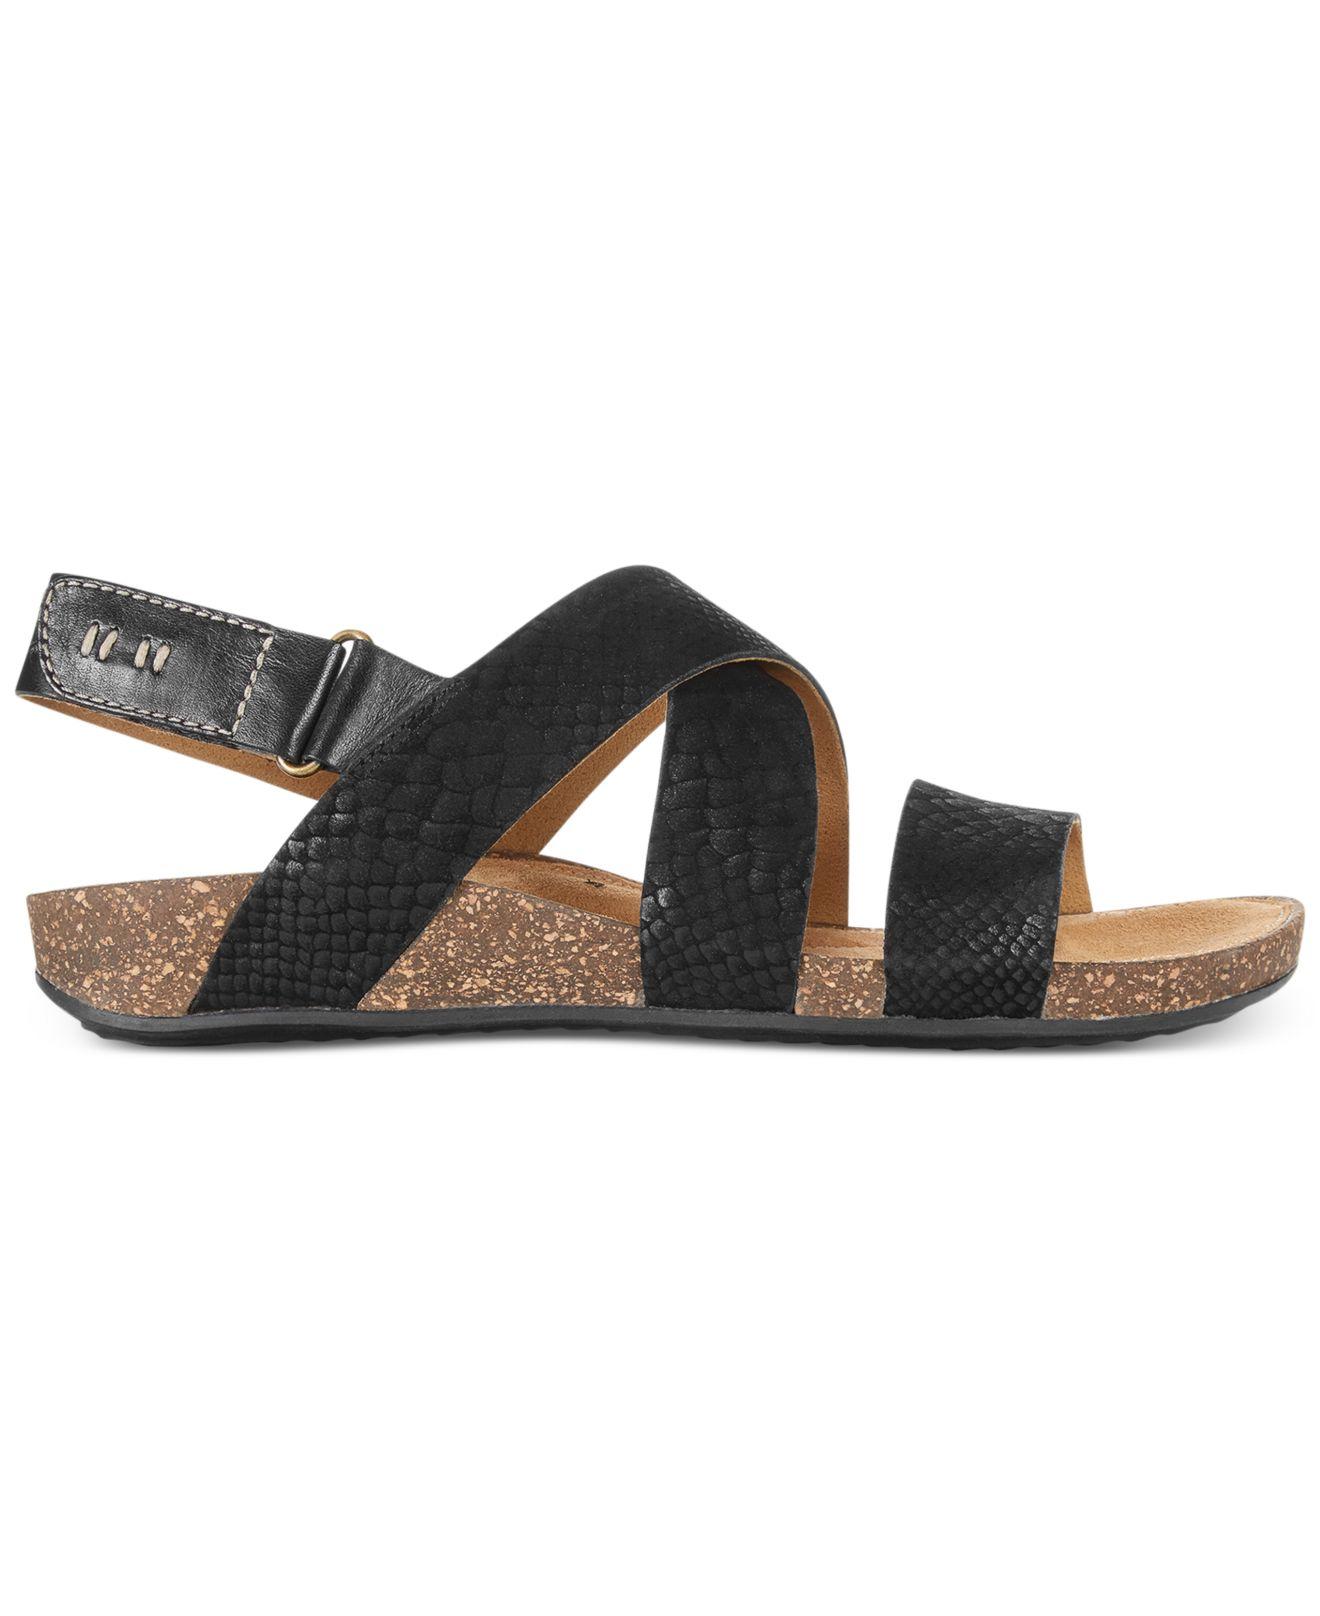 47155ef768ef0 Lyst - Clarks Artisan Women s Perri Dunes Footbed Sandals in Black